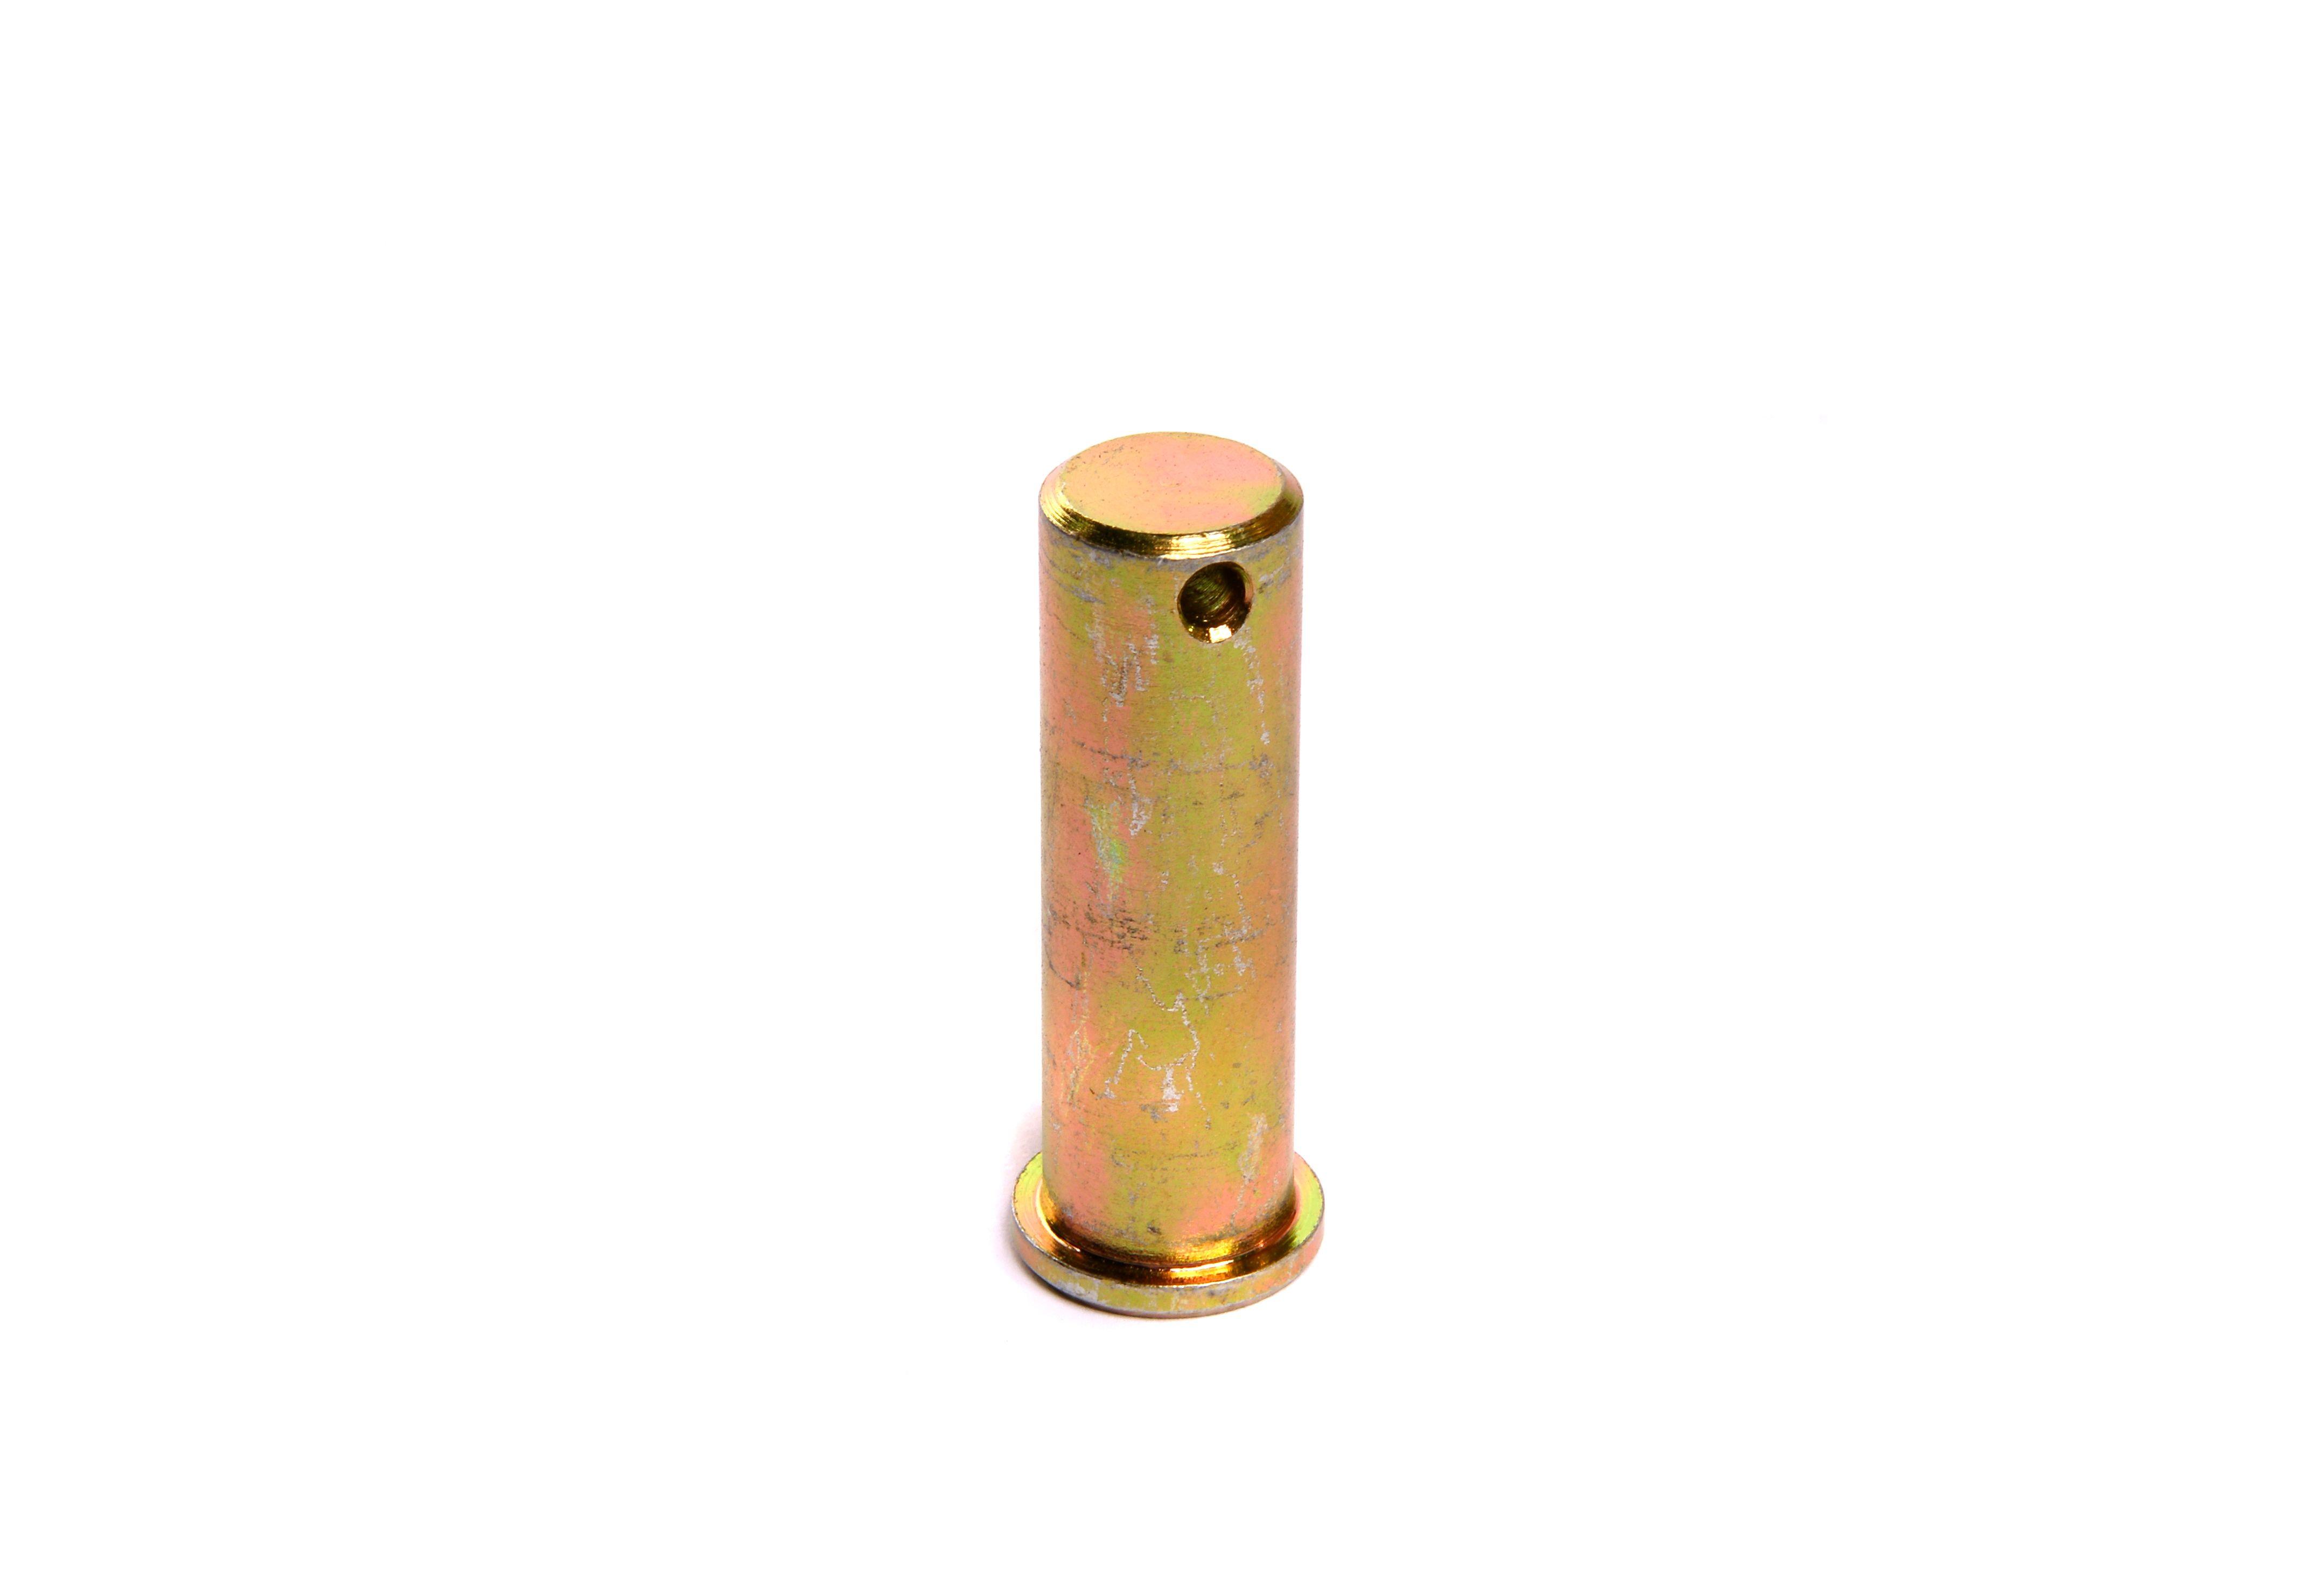 MASSEY FERGUSON CRAWLER PIN (AGCO) 1825449M1